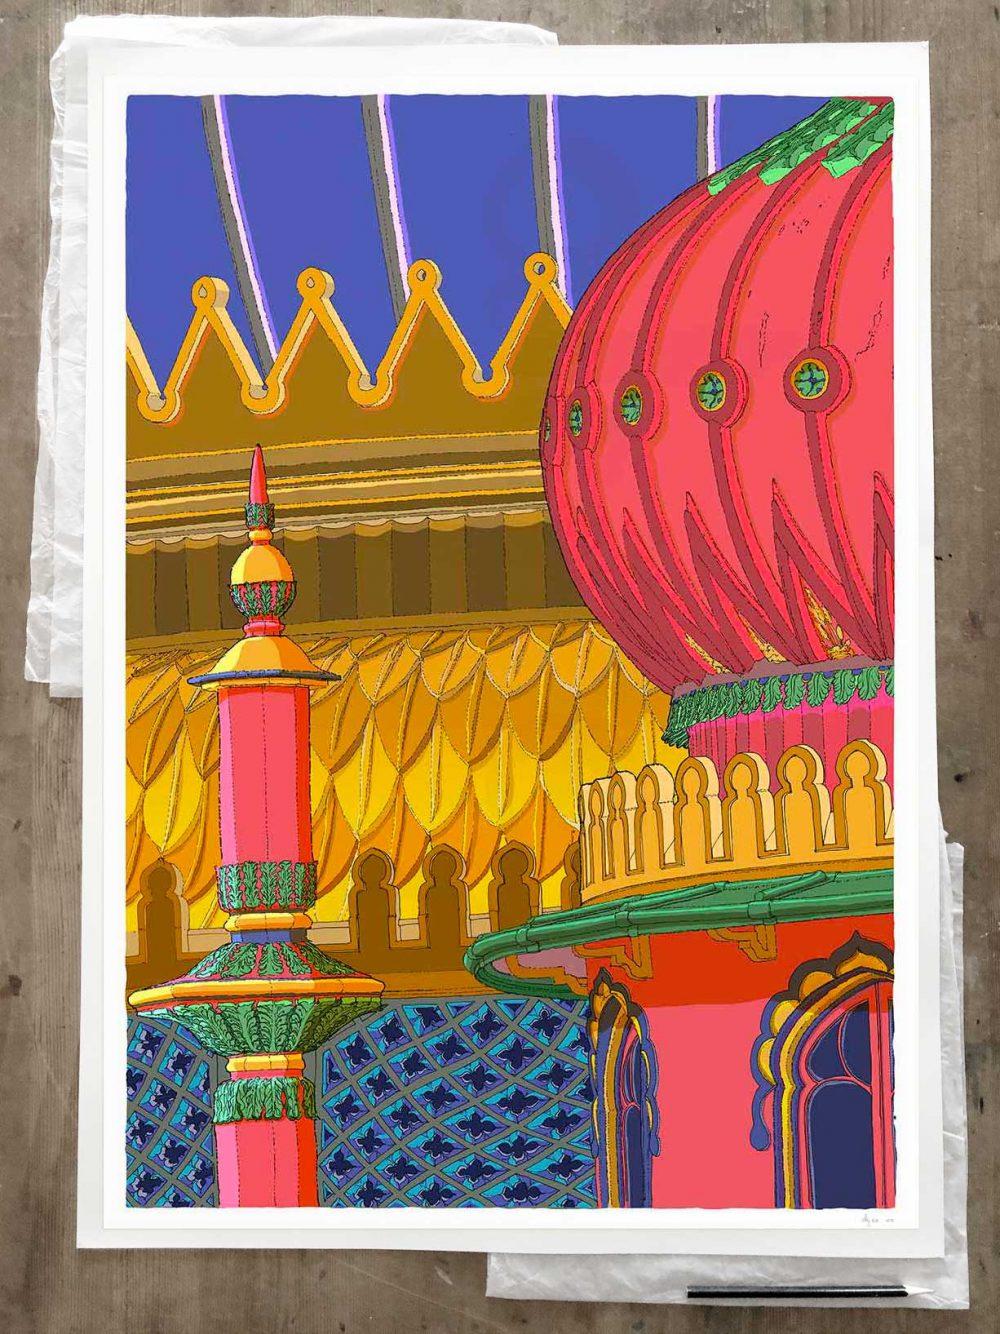 Fine art print by artist alej ez titled Regency Brighton Pavilion Finial and Domes